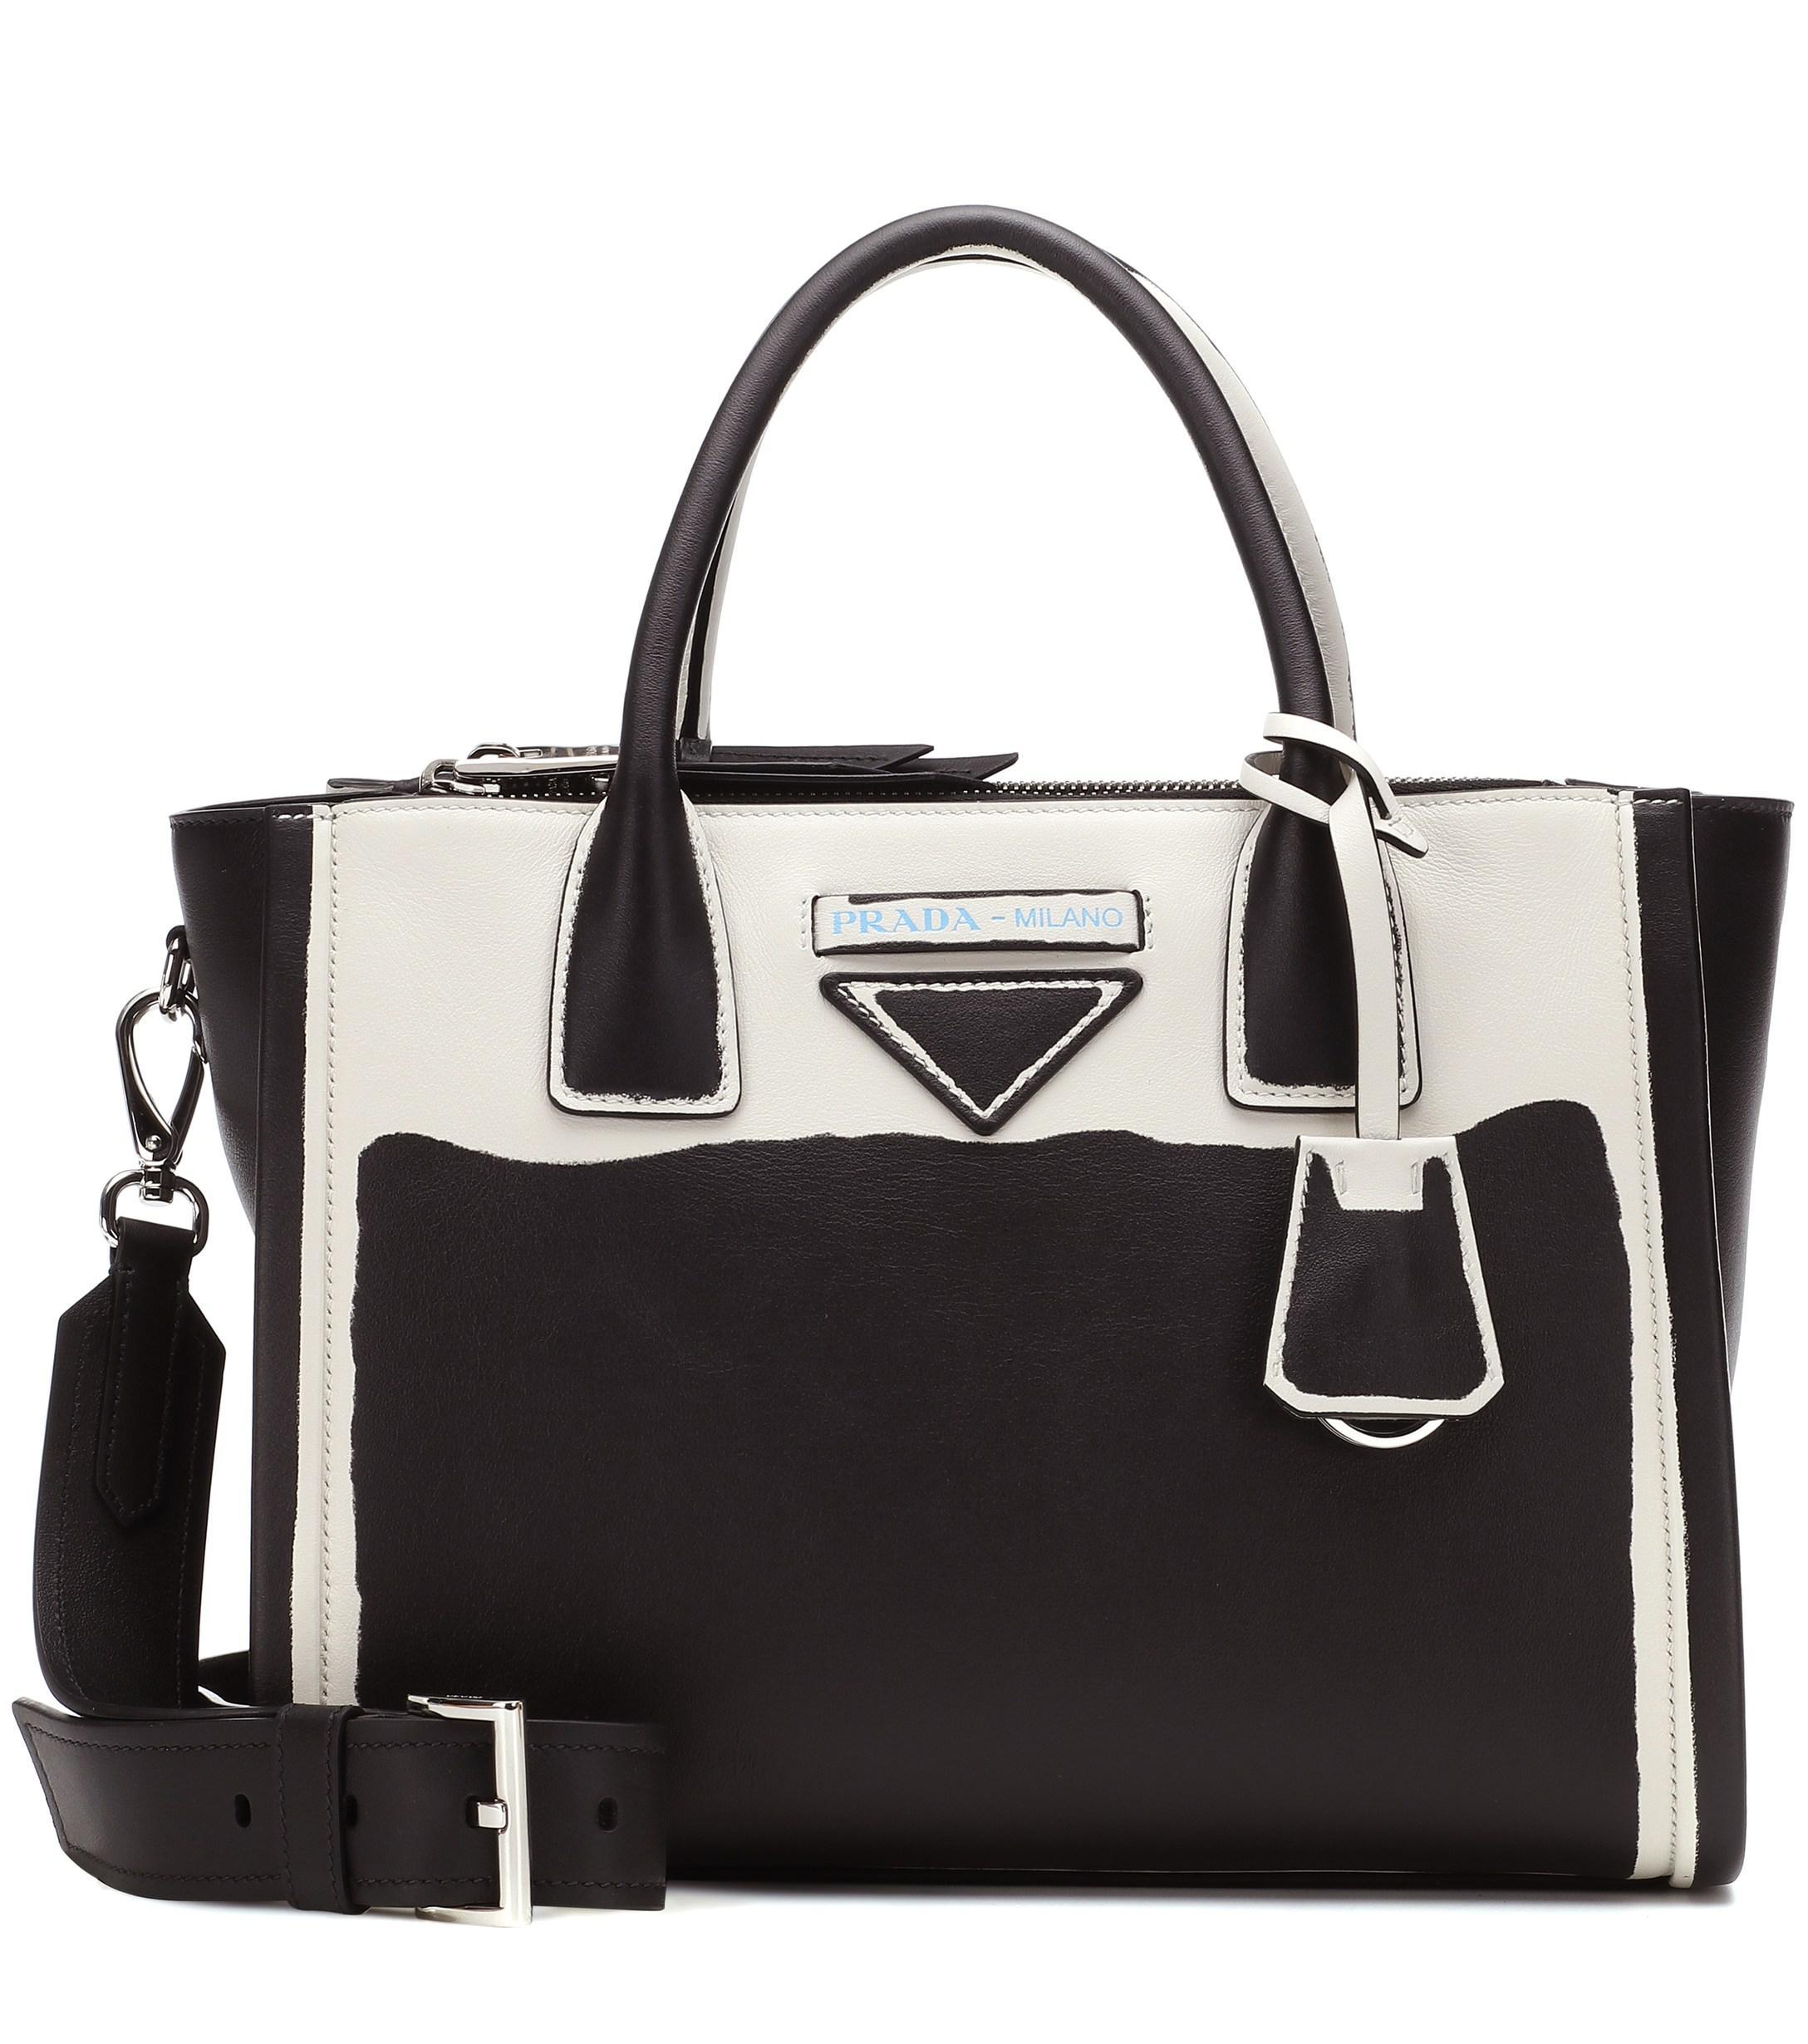 3424dab22a Lyst - Prada Concept Galleria Leather Tote in Black